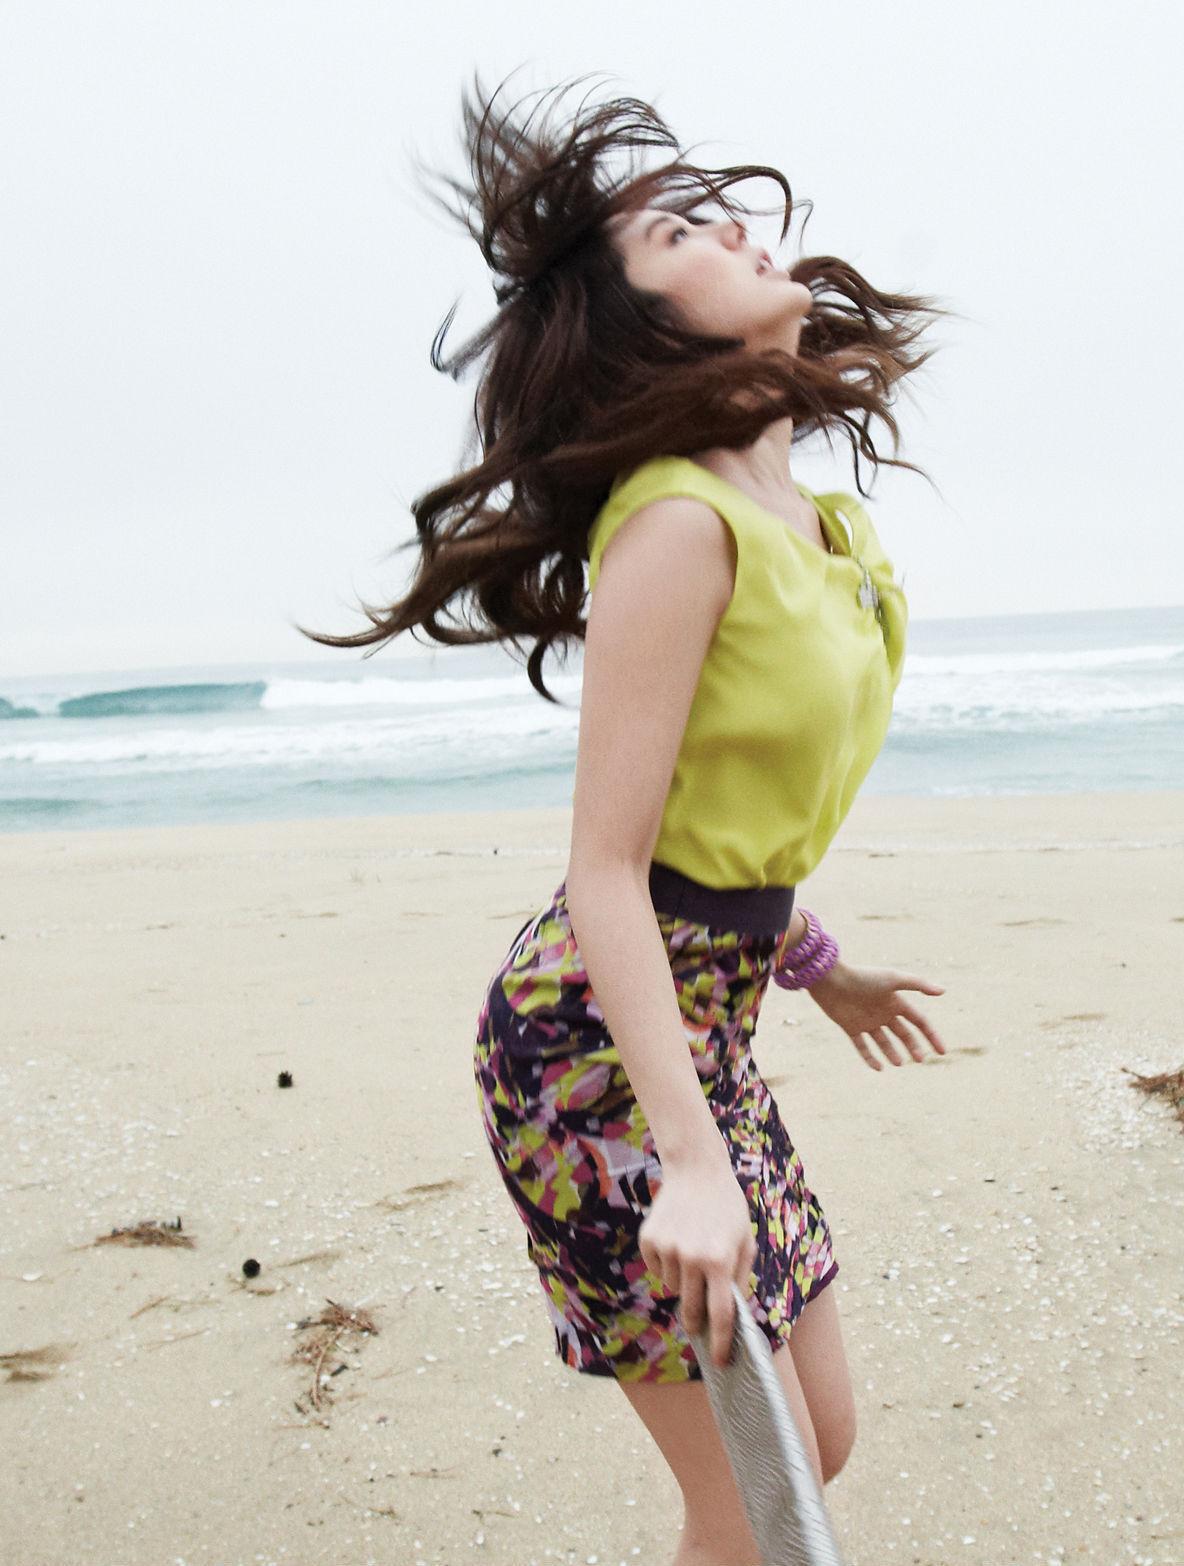 http://3.bp.blogspot.com/-TVsZVjPZzbo/UAl-6m1HyoI/AAAAAAAAKIs/BoHBhdbj-zM/s1600/yoon-eun-hye_korean+(8).jpg